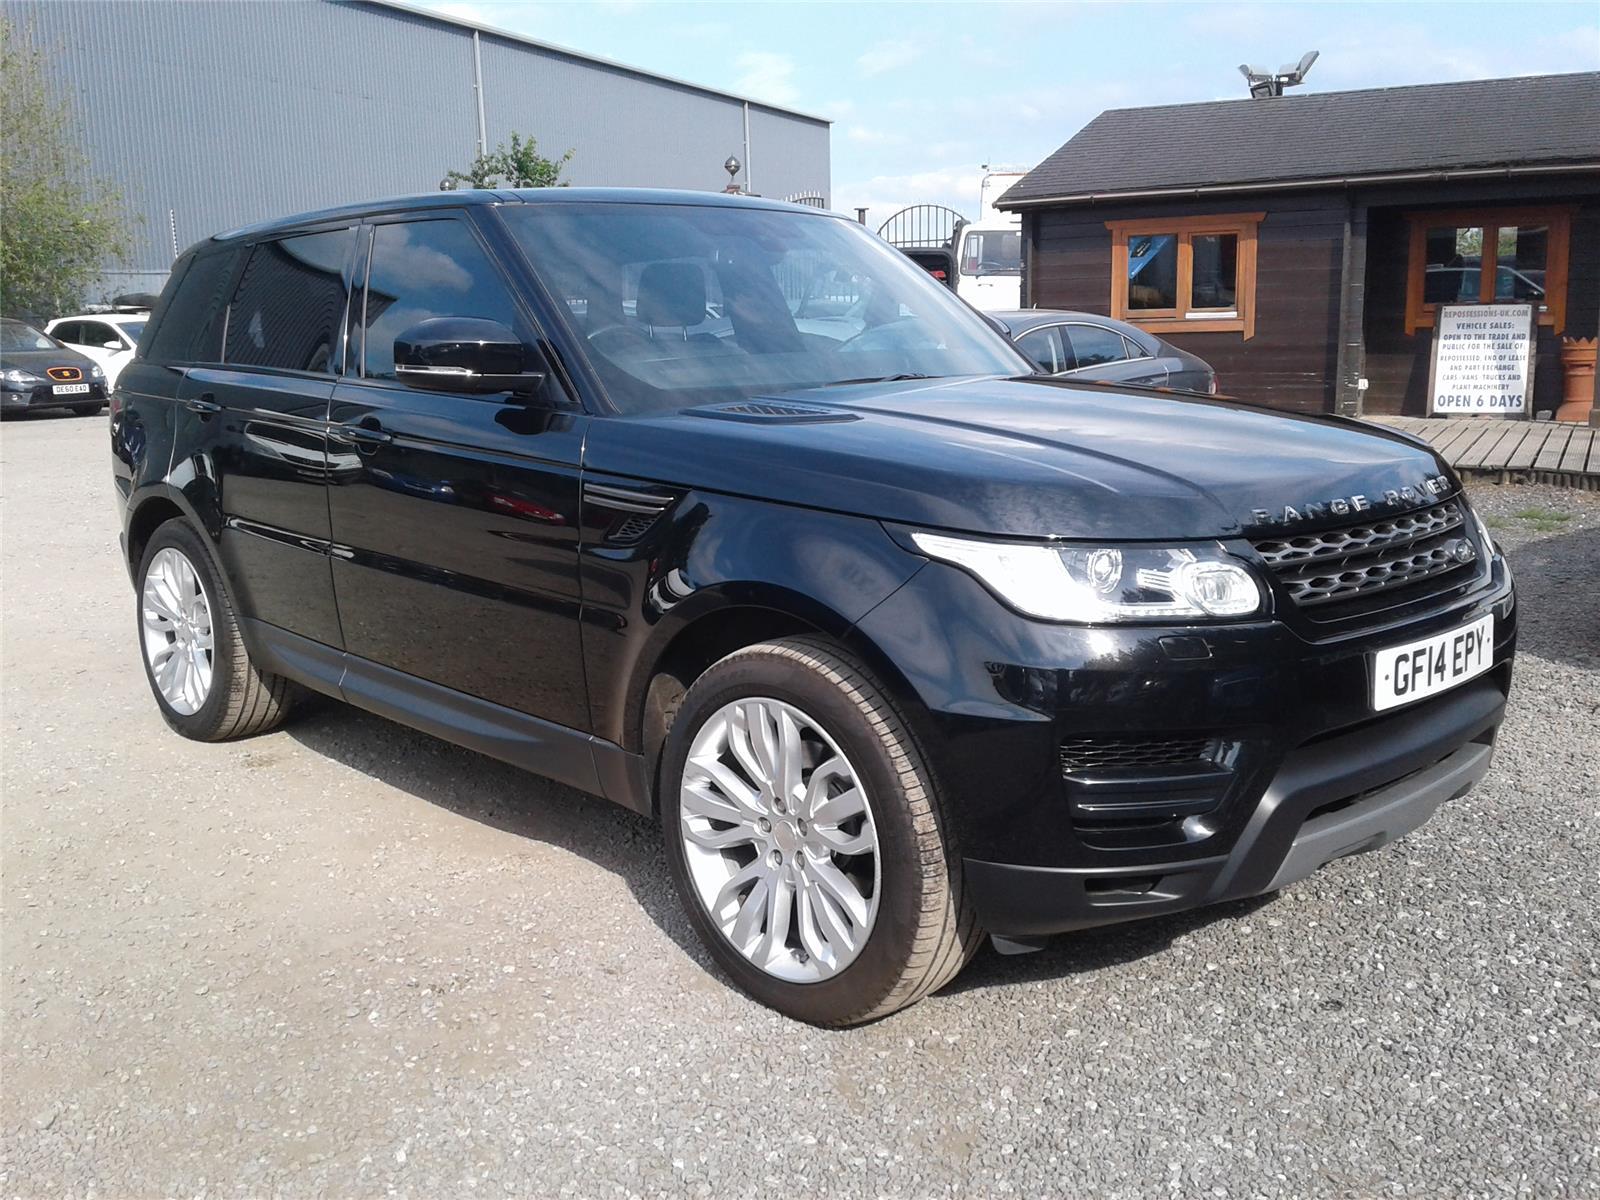 2014 Land Rover Range Rover SE Low Power 4WD 2993 Diesel Automatic 8 Speed 5 Door Estate